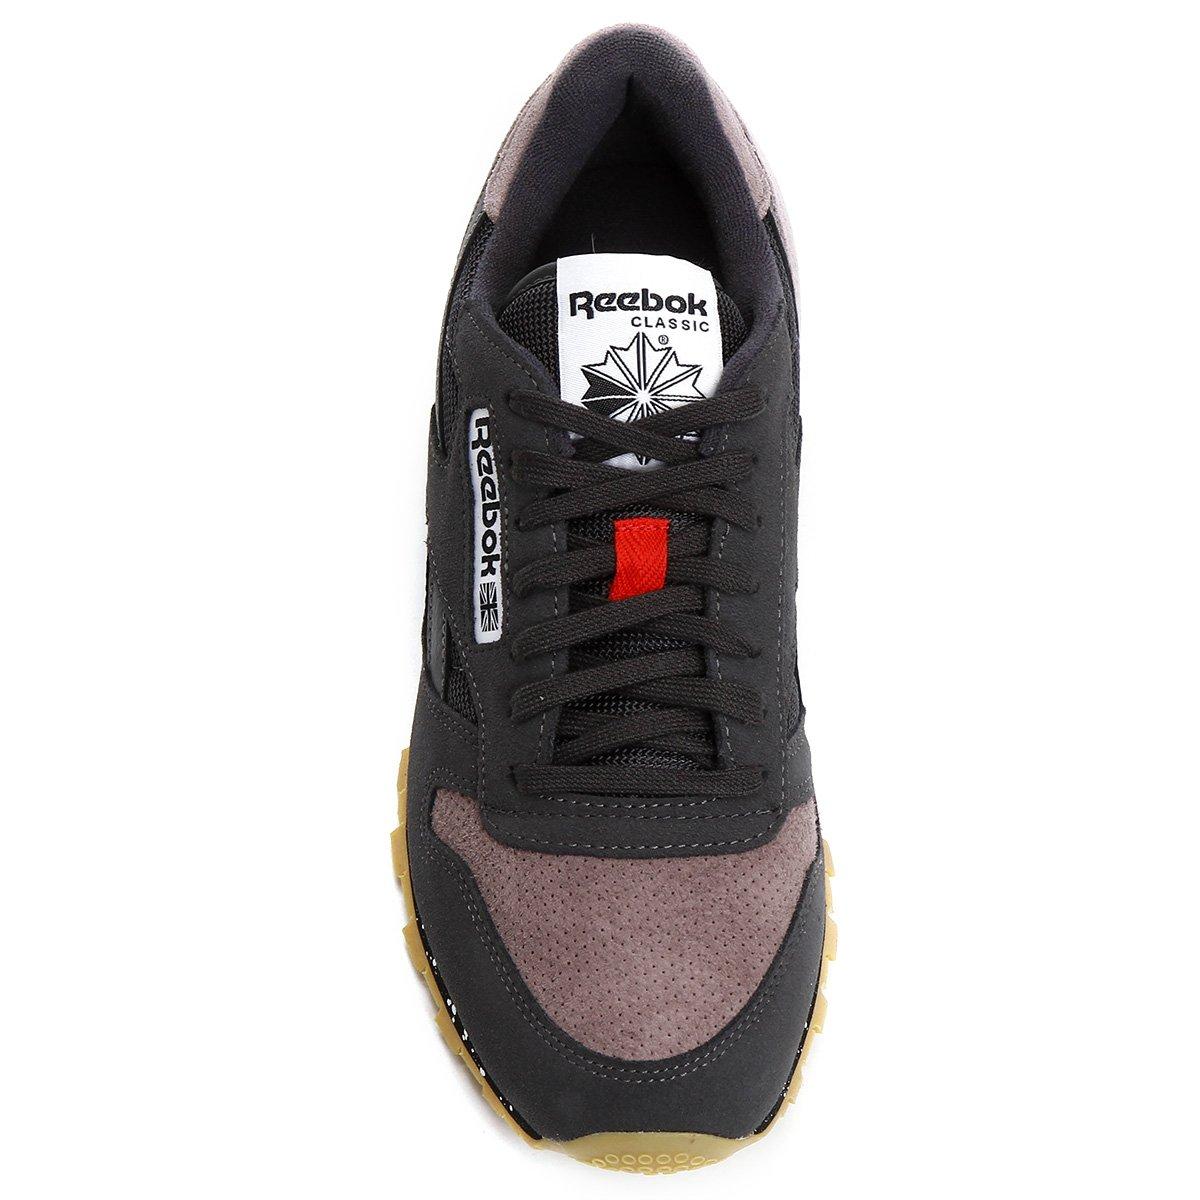 Tênis Reebok Classic Leather Sm - Compre Agora  d7e0b07db99aa